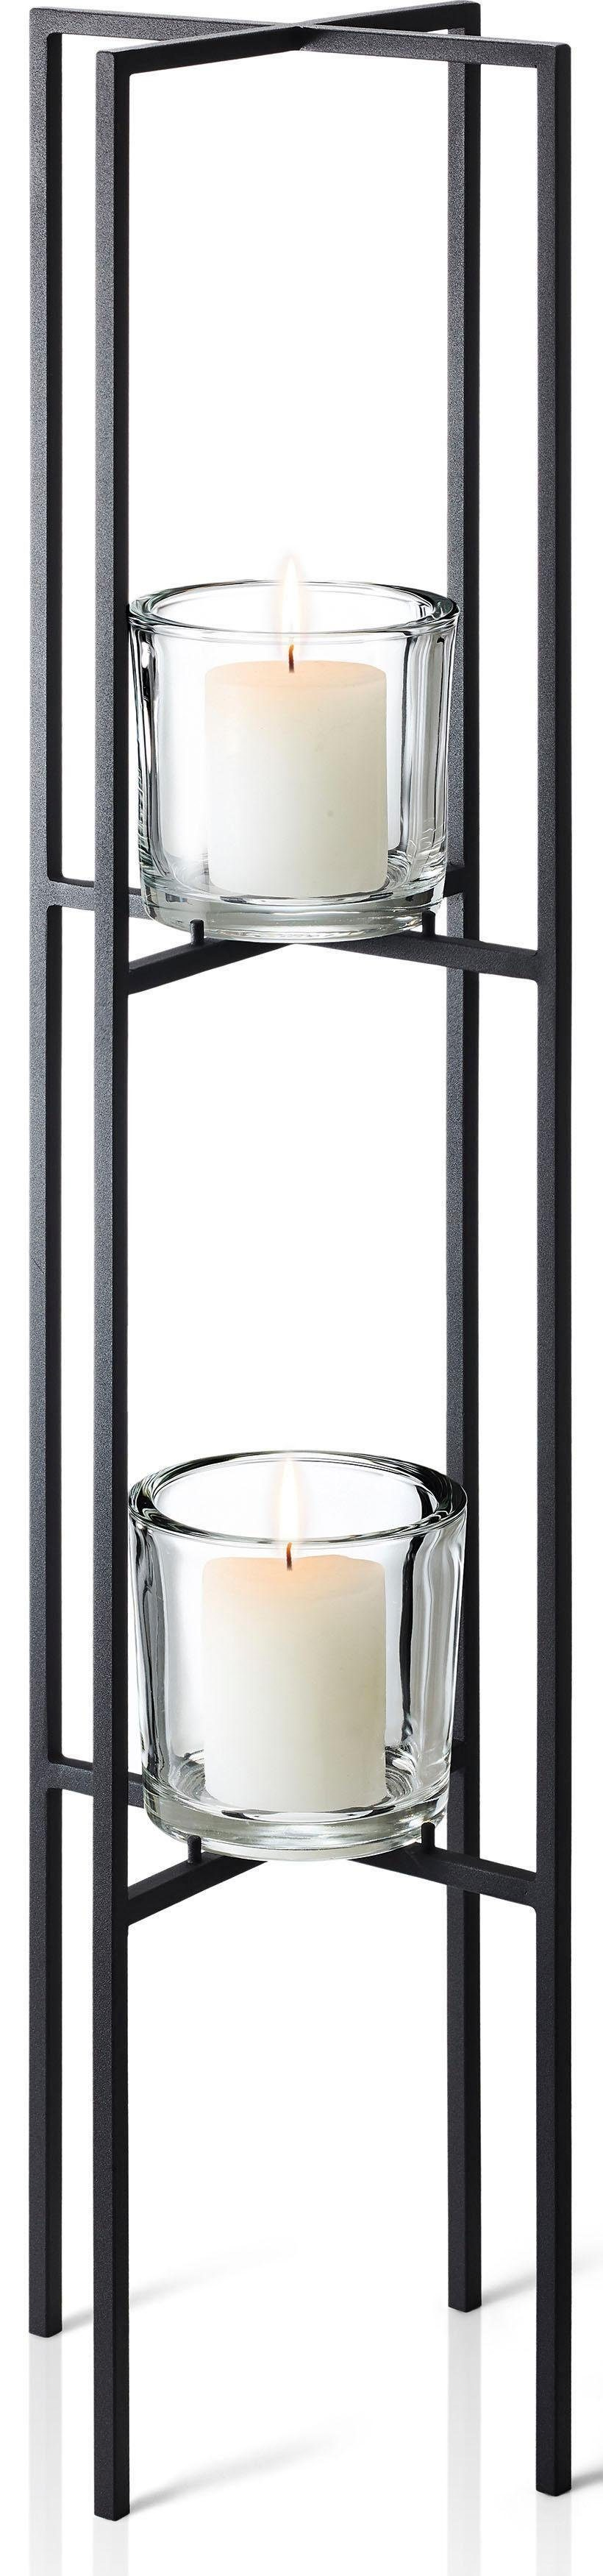 BLOMUS Kerzenständer NERO schwarz Kerzenhalter Kerzen Laternen Wohnaccessoires